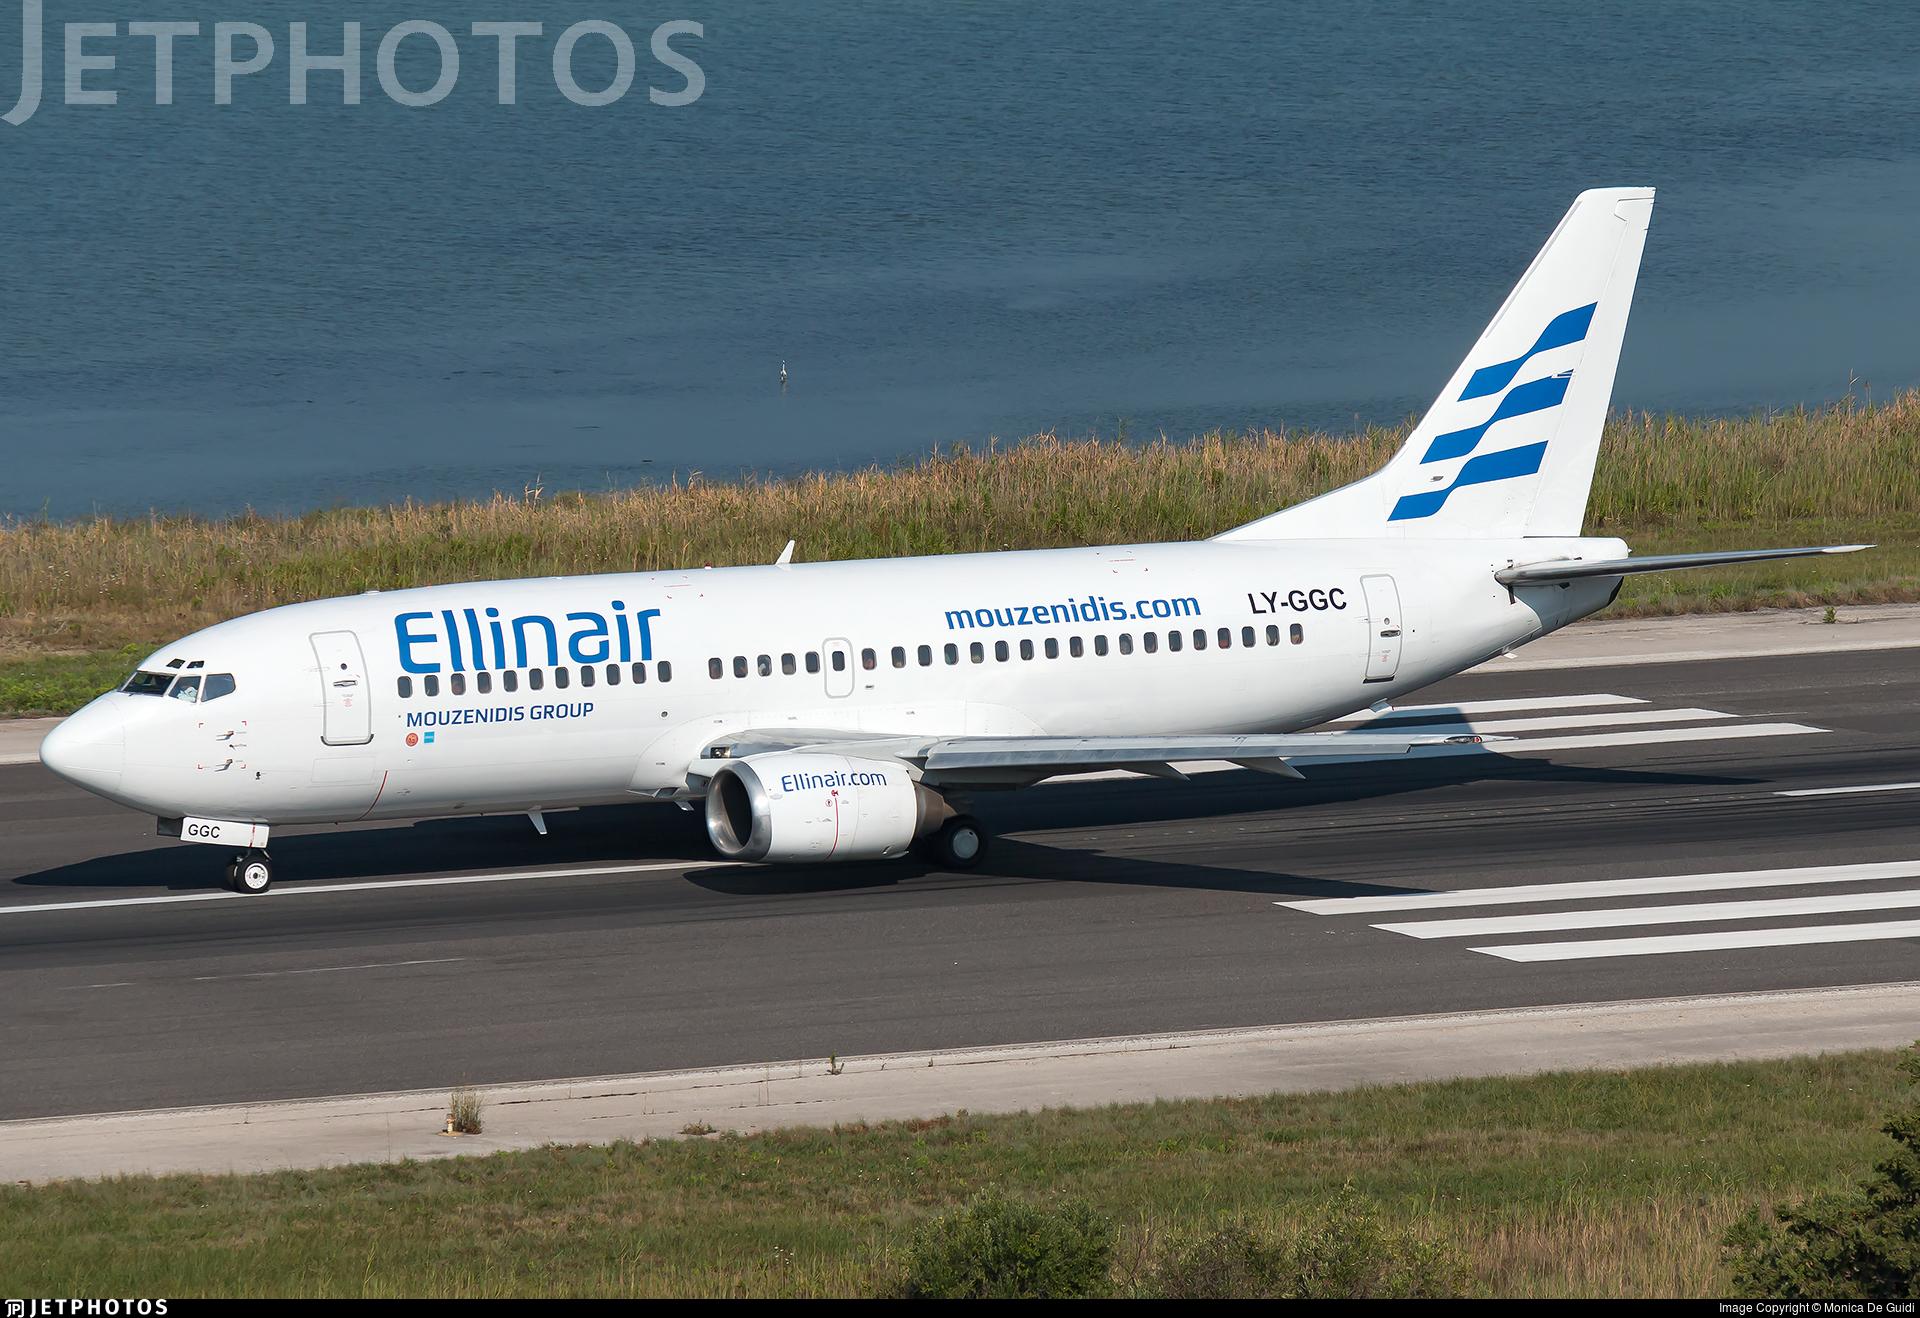 LY-GGC - Boeing 737-3Q8 - Ellinair (Grand Cru Airlines)